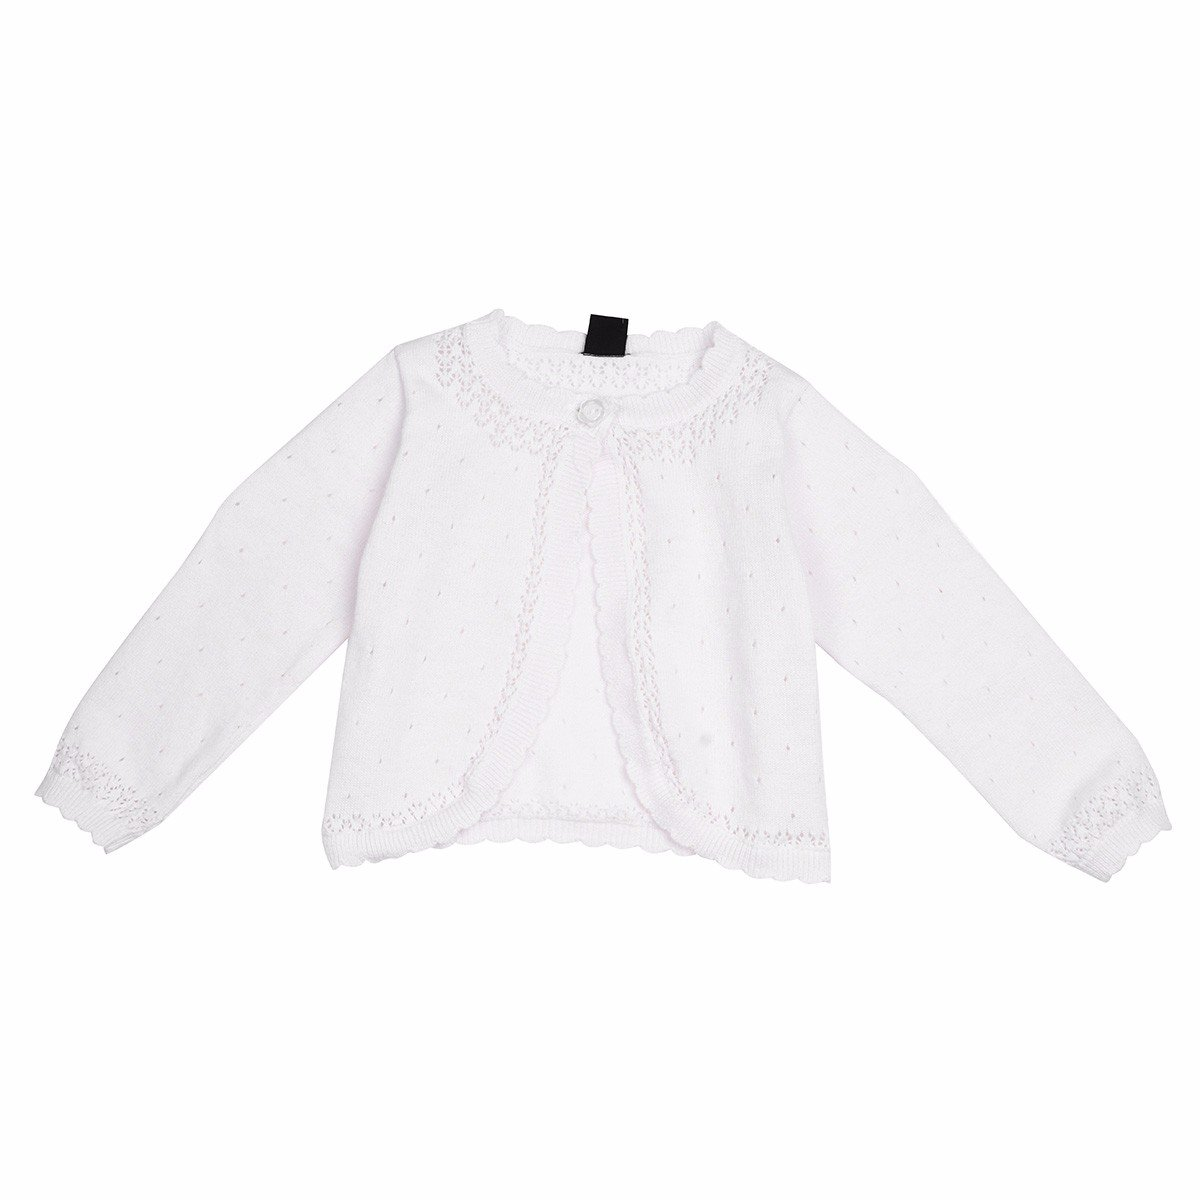 iEFiEL Baby Girls Knit Long Sleeve One Button Closure Bolero Cardigan Shrug